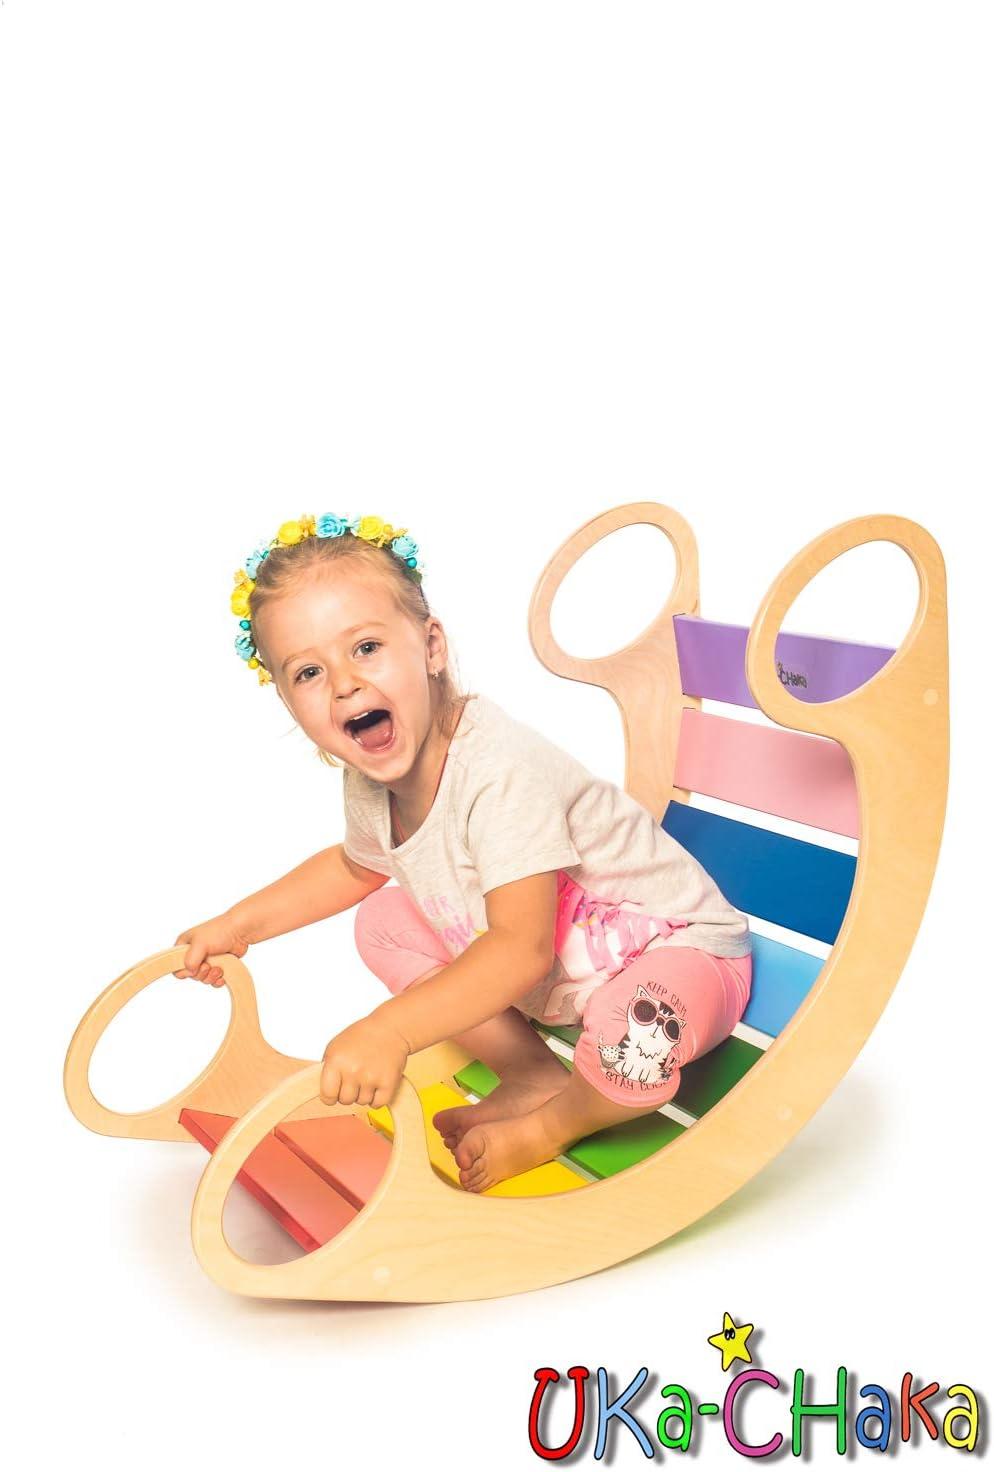 Blue BOM UKa-CHaka Wooden Rainbow Rocker Pickler Balance Board Montessoty Toys for Kid 0-5 Years Multi Mini